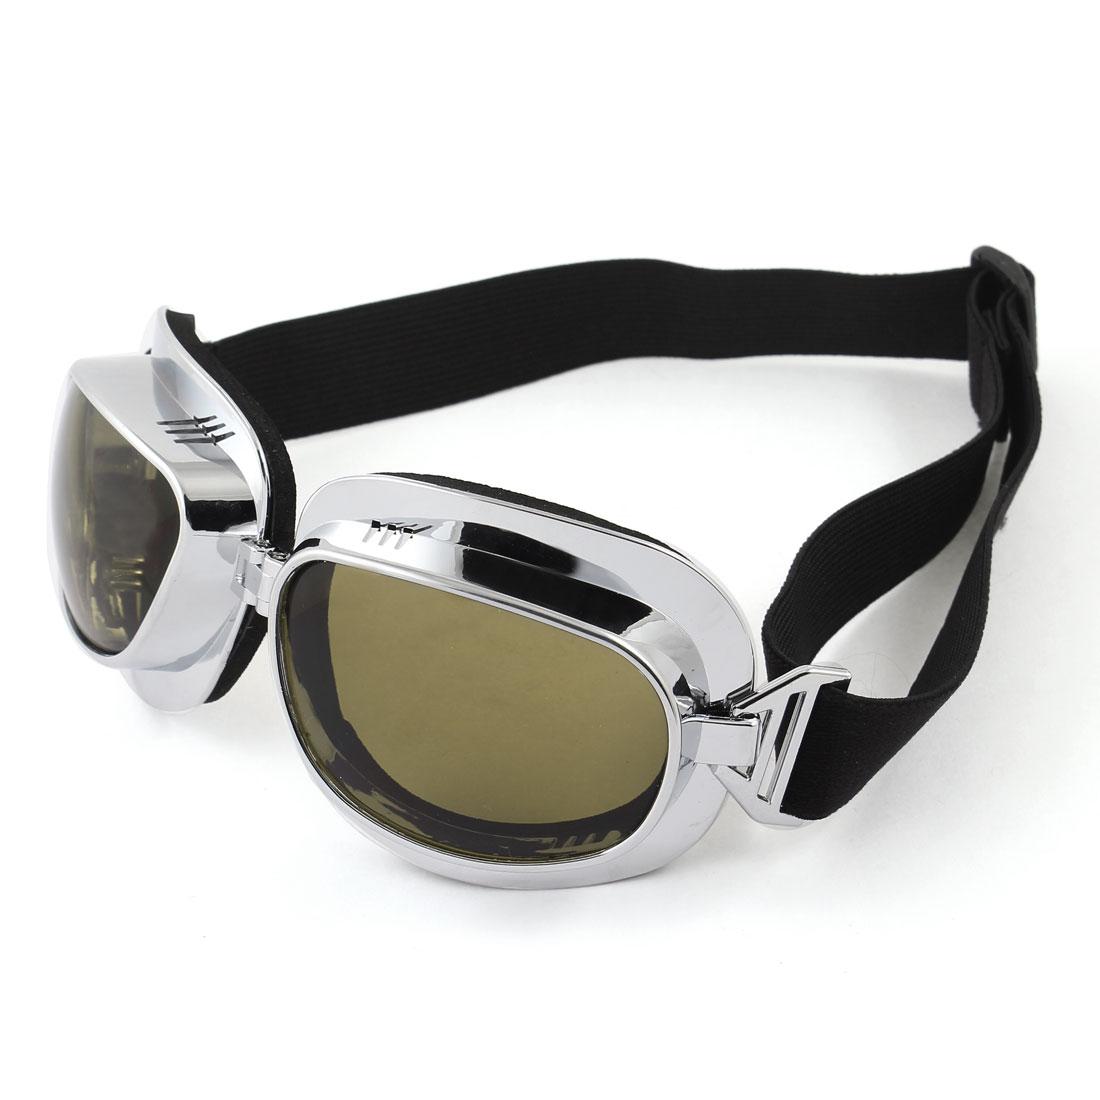 Unisex Black Lens Sponge Pad Frame Ski Snowboard Sports Goggles  Glasses